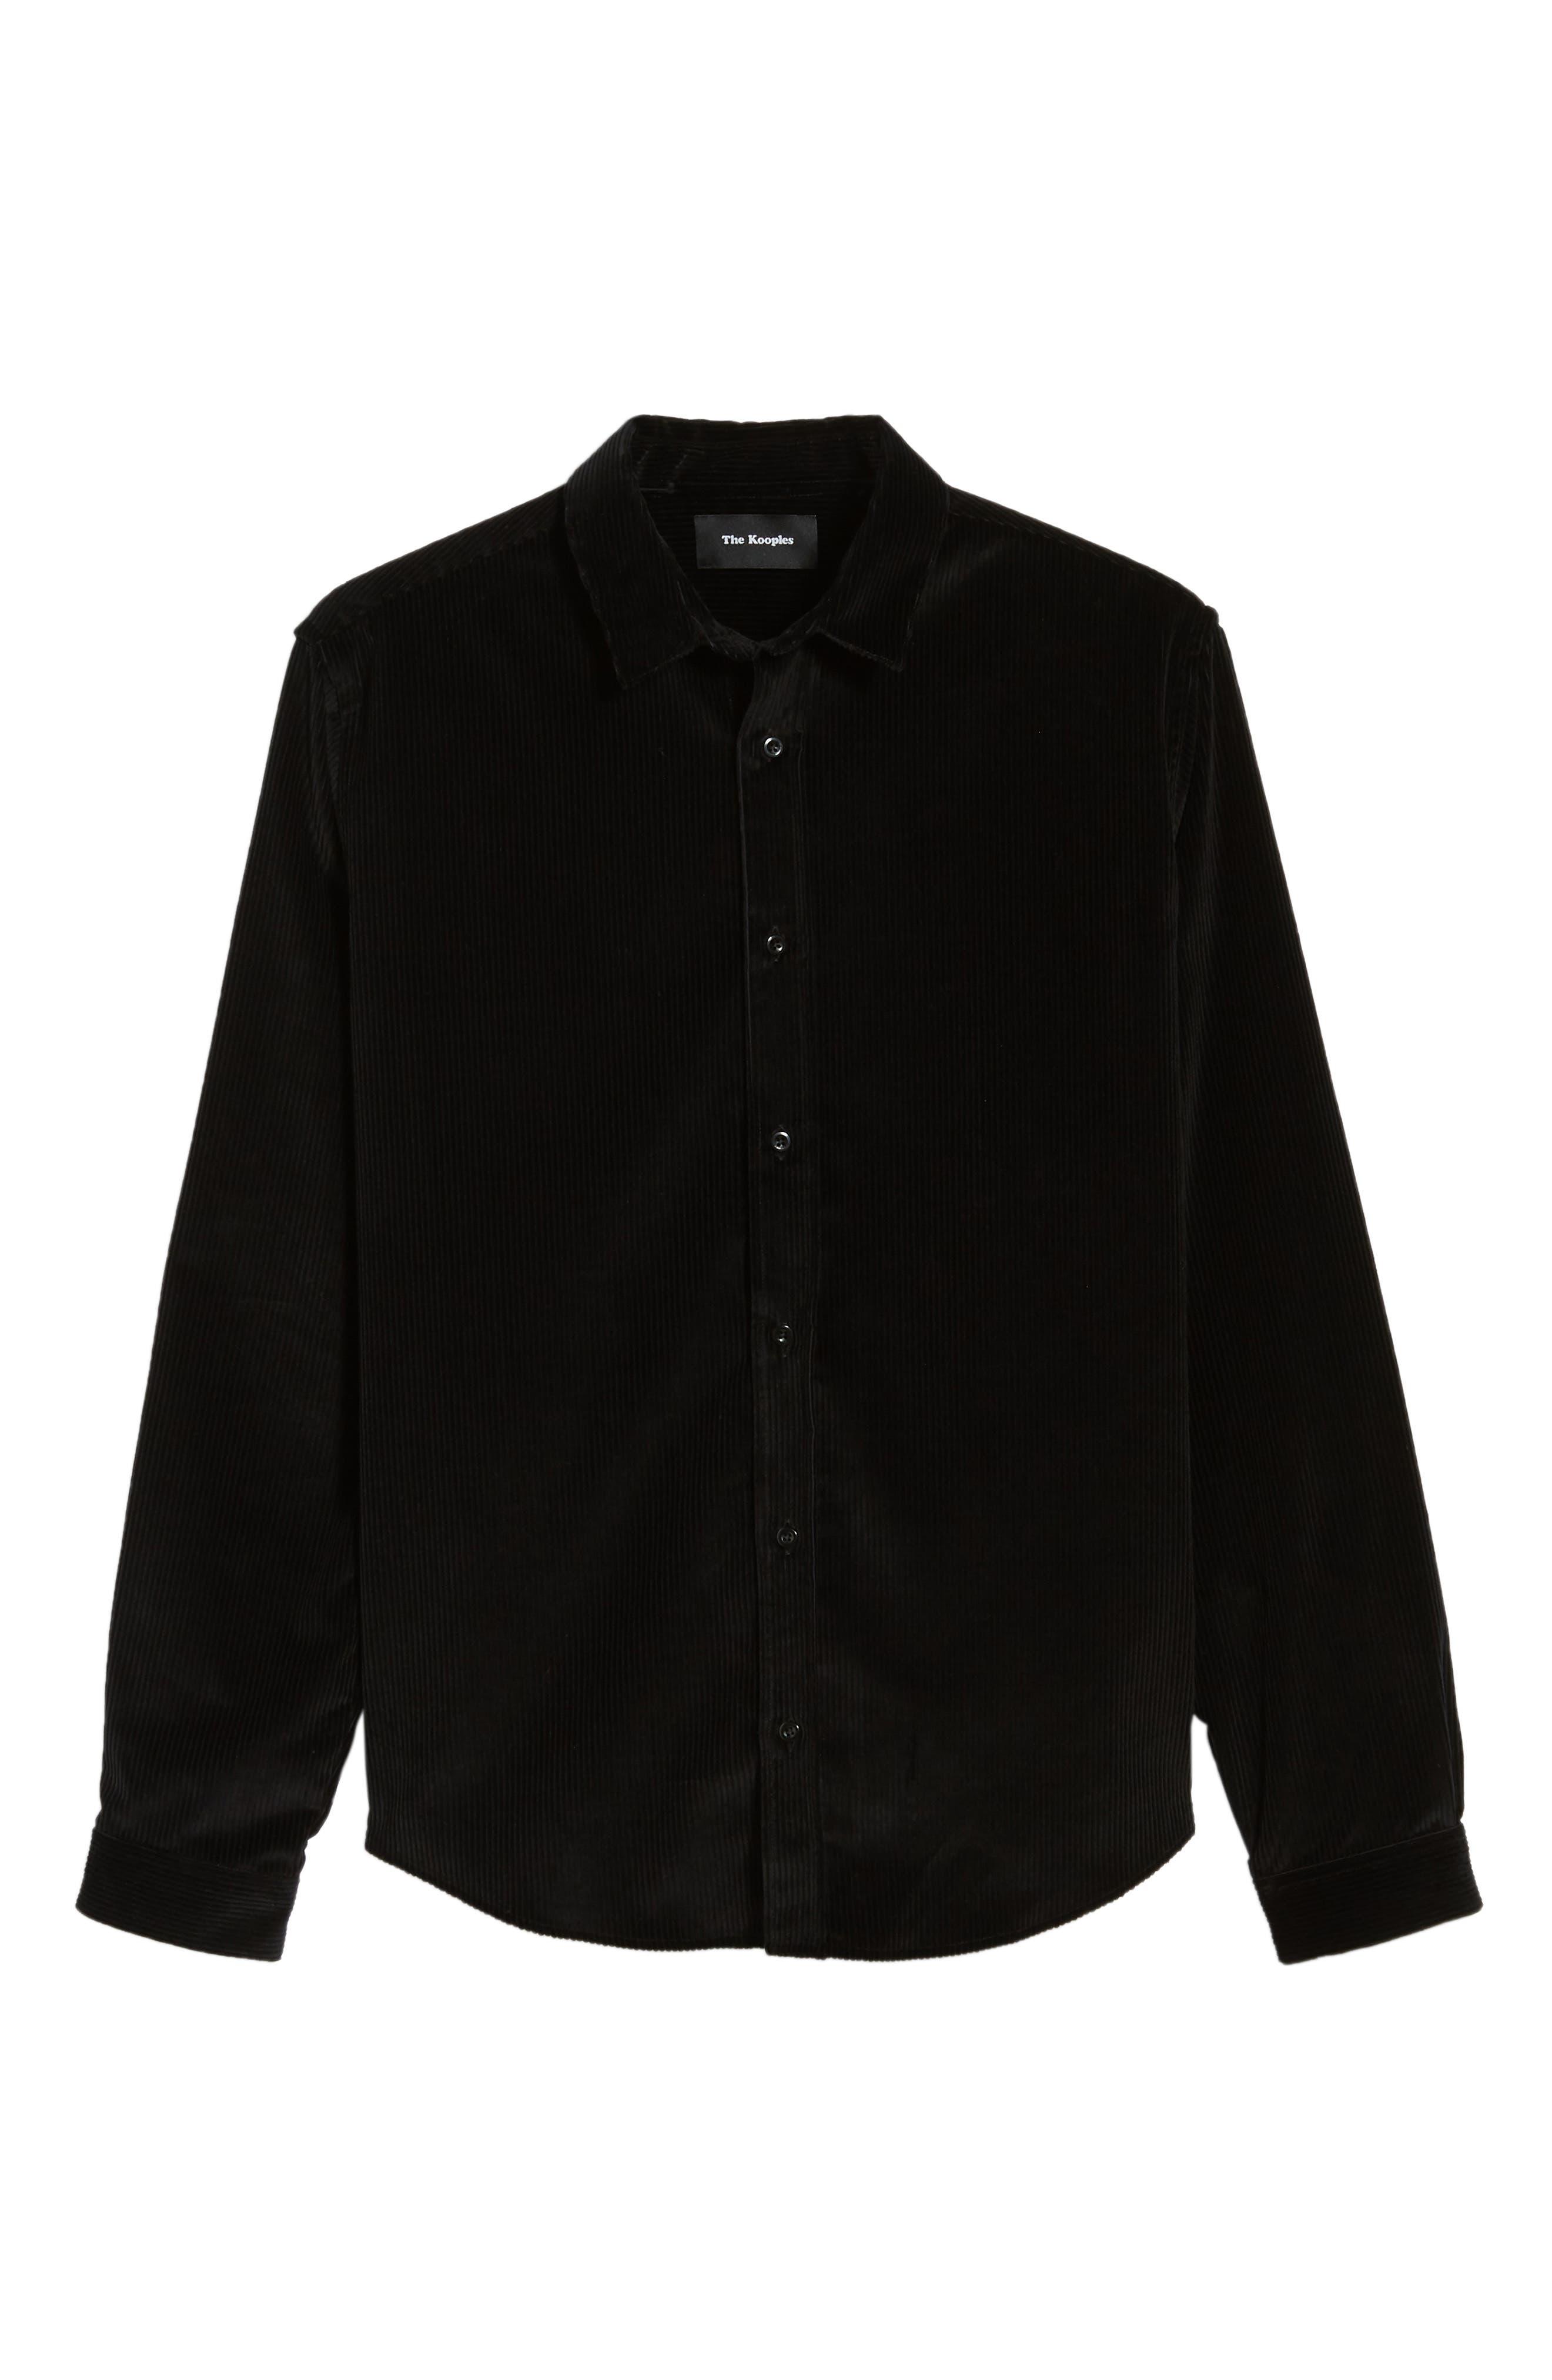 THE KOOPLES,                             Regular Fit Corduroy Shirt,                             Alternate thumbnail 5, color,                             001